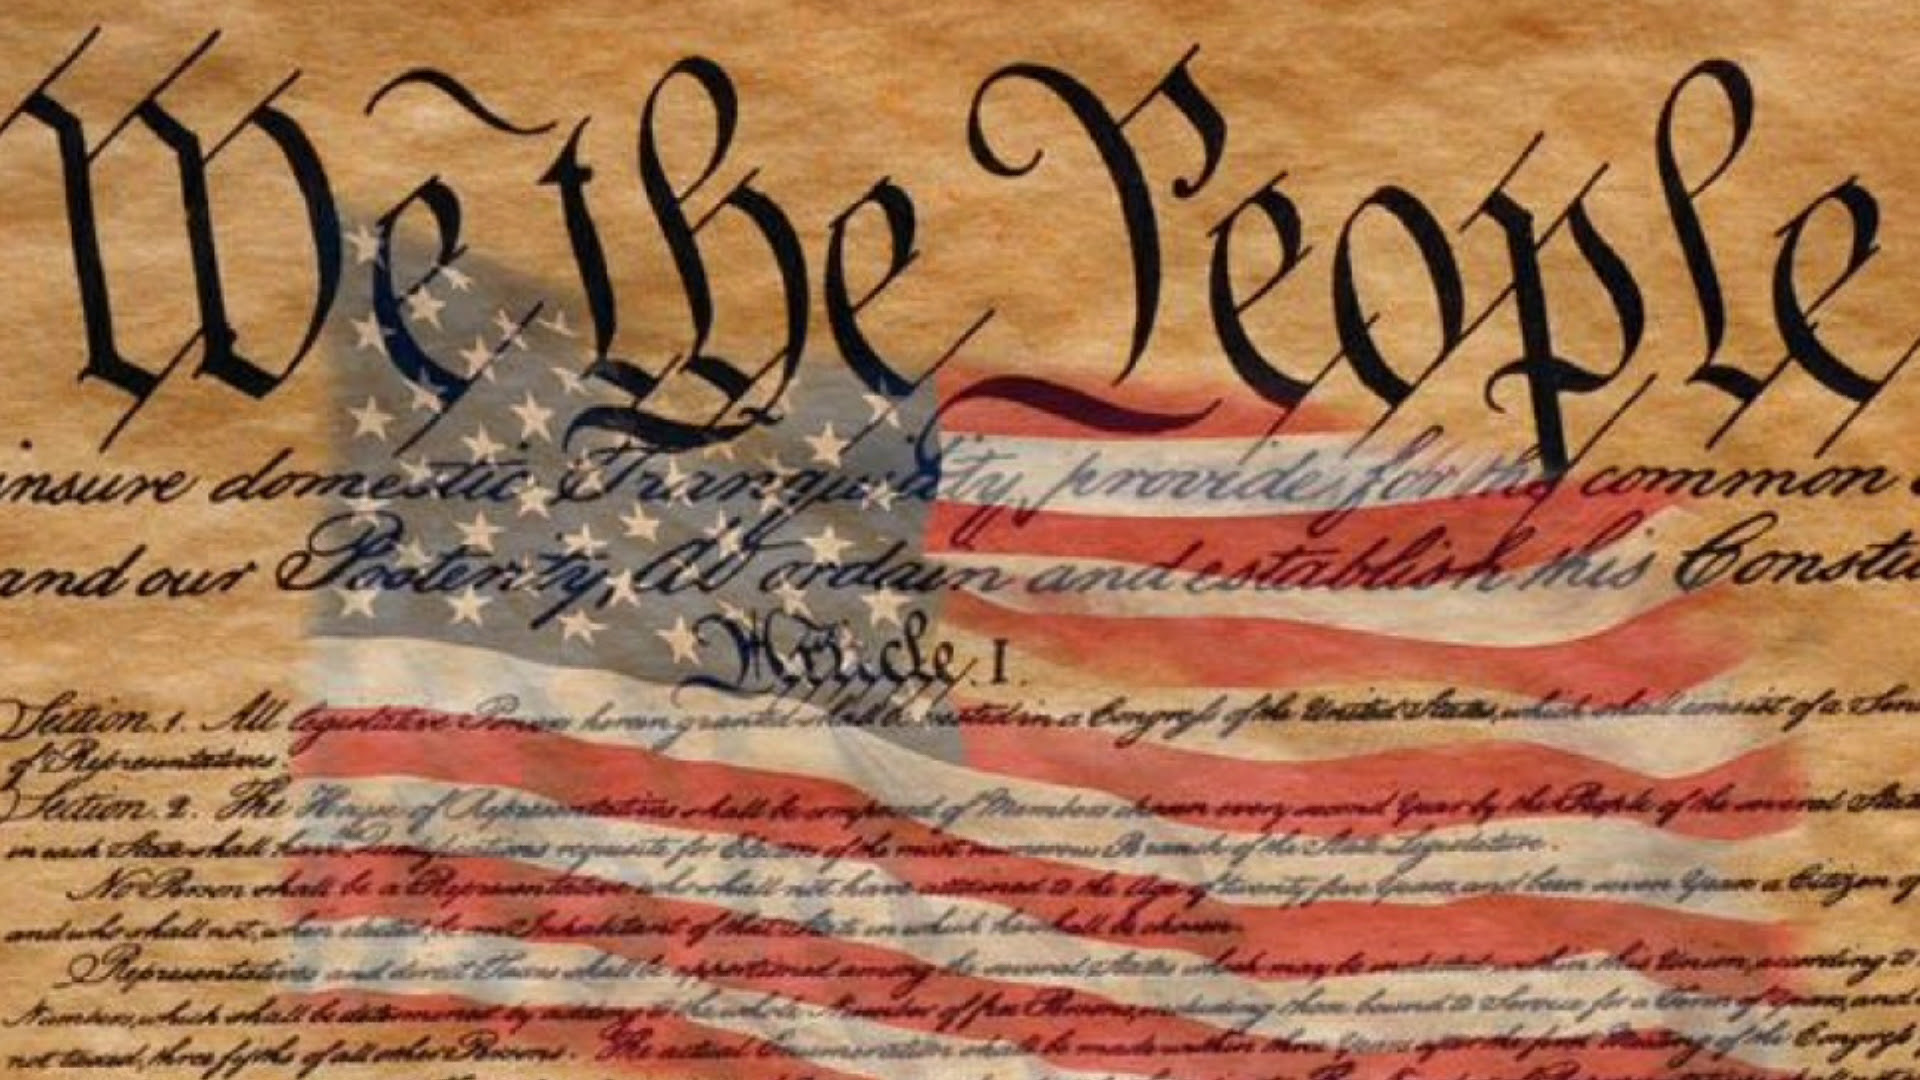 http://www.fedupusa.org/wp-content/uploads/2012/12/United+States+Constitution+Sept+2012.jpg